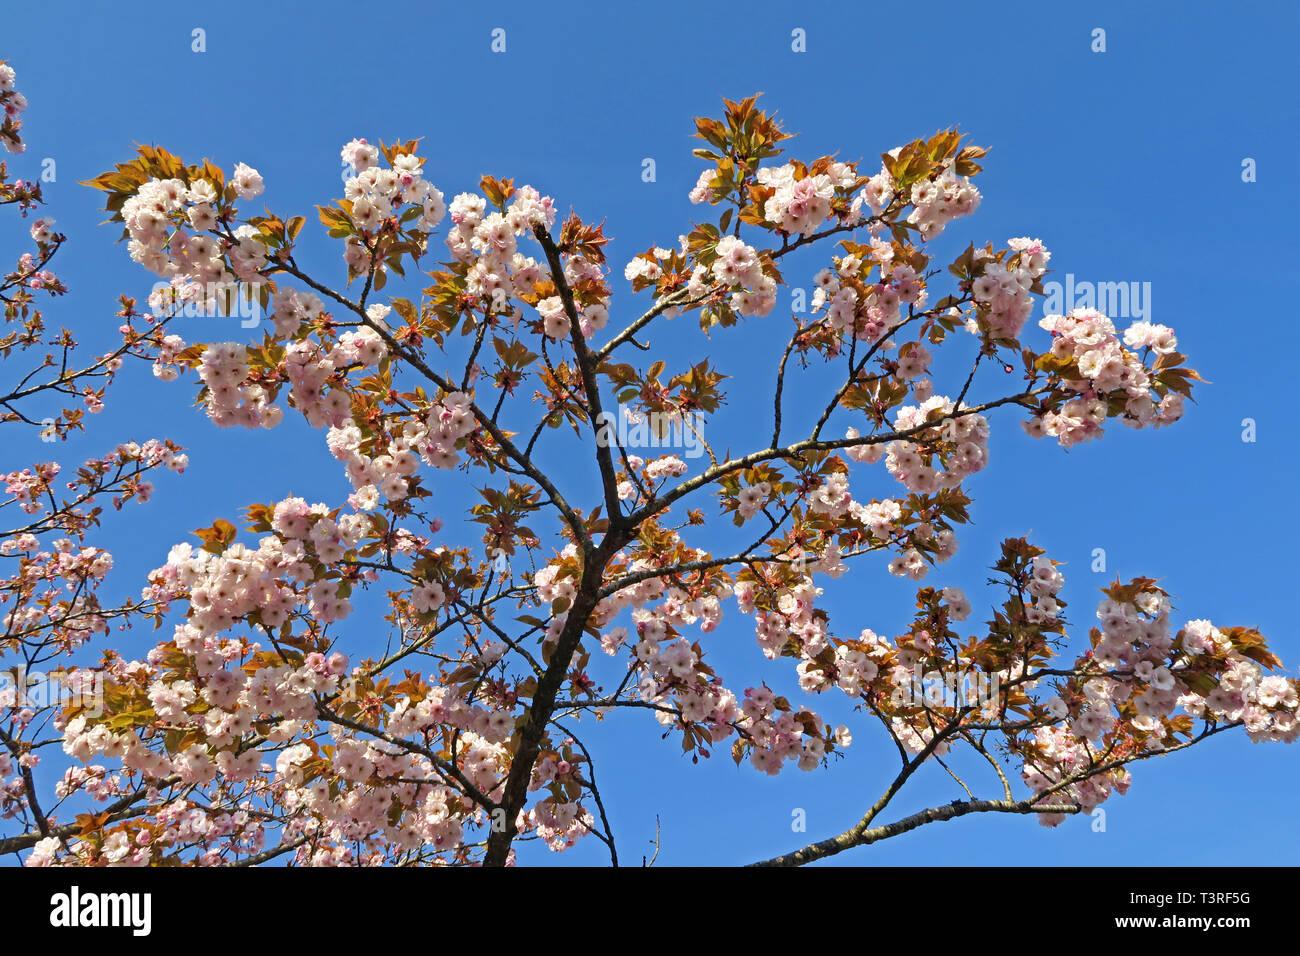 GoTonySmith,HotpixUK,@HotpixUK,Warrington,WBC,Cheshire,North West England,UK,tree,shrub,white,pink,flower,flowers,branch,branches,sunny,sunny day,Hatton,Norcott Brook,blue sky,Springtime,cherryblossom,artistic,closeup,natural,nature,outdoor,outside,garden,park,Cherry tree in full blossom,Cherry tree,full blossom,healthy,genus Prunus,flowering cherries,flowering cherry,springtime